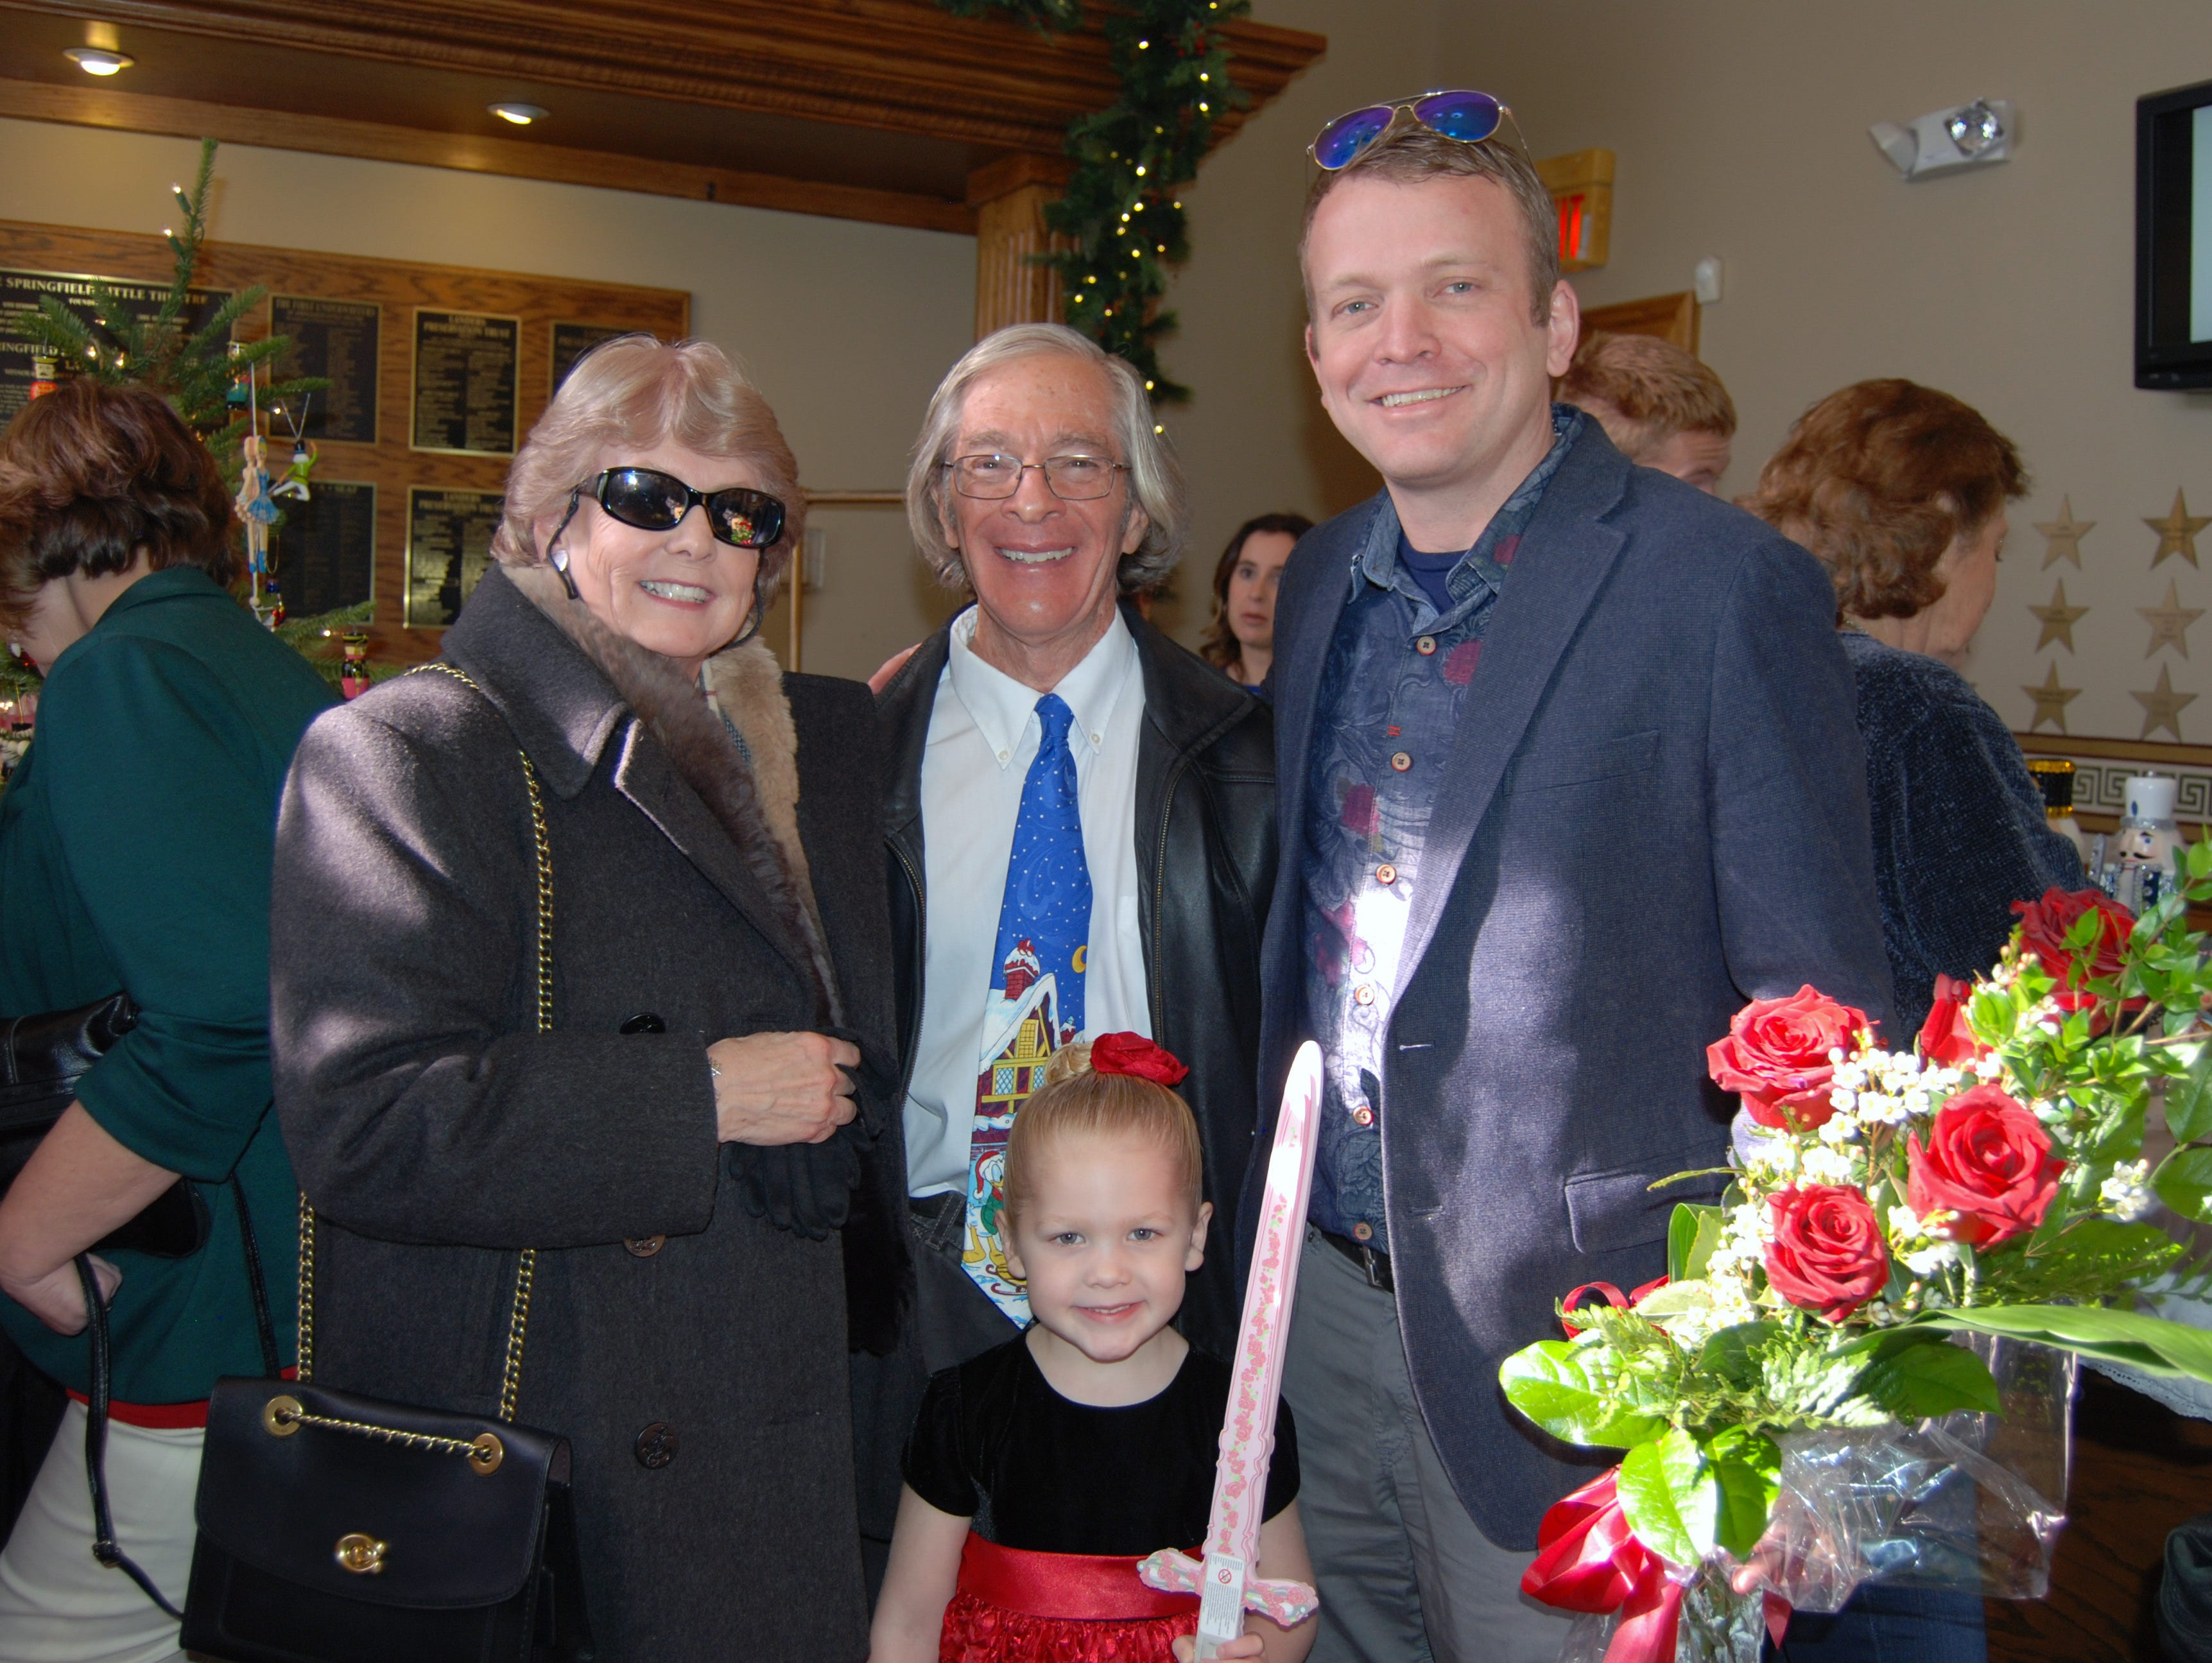 Karen and Jeff Richardson and Cora and Robert Shaw